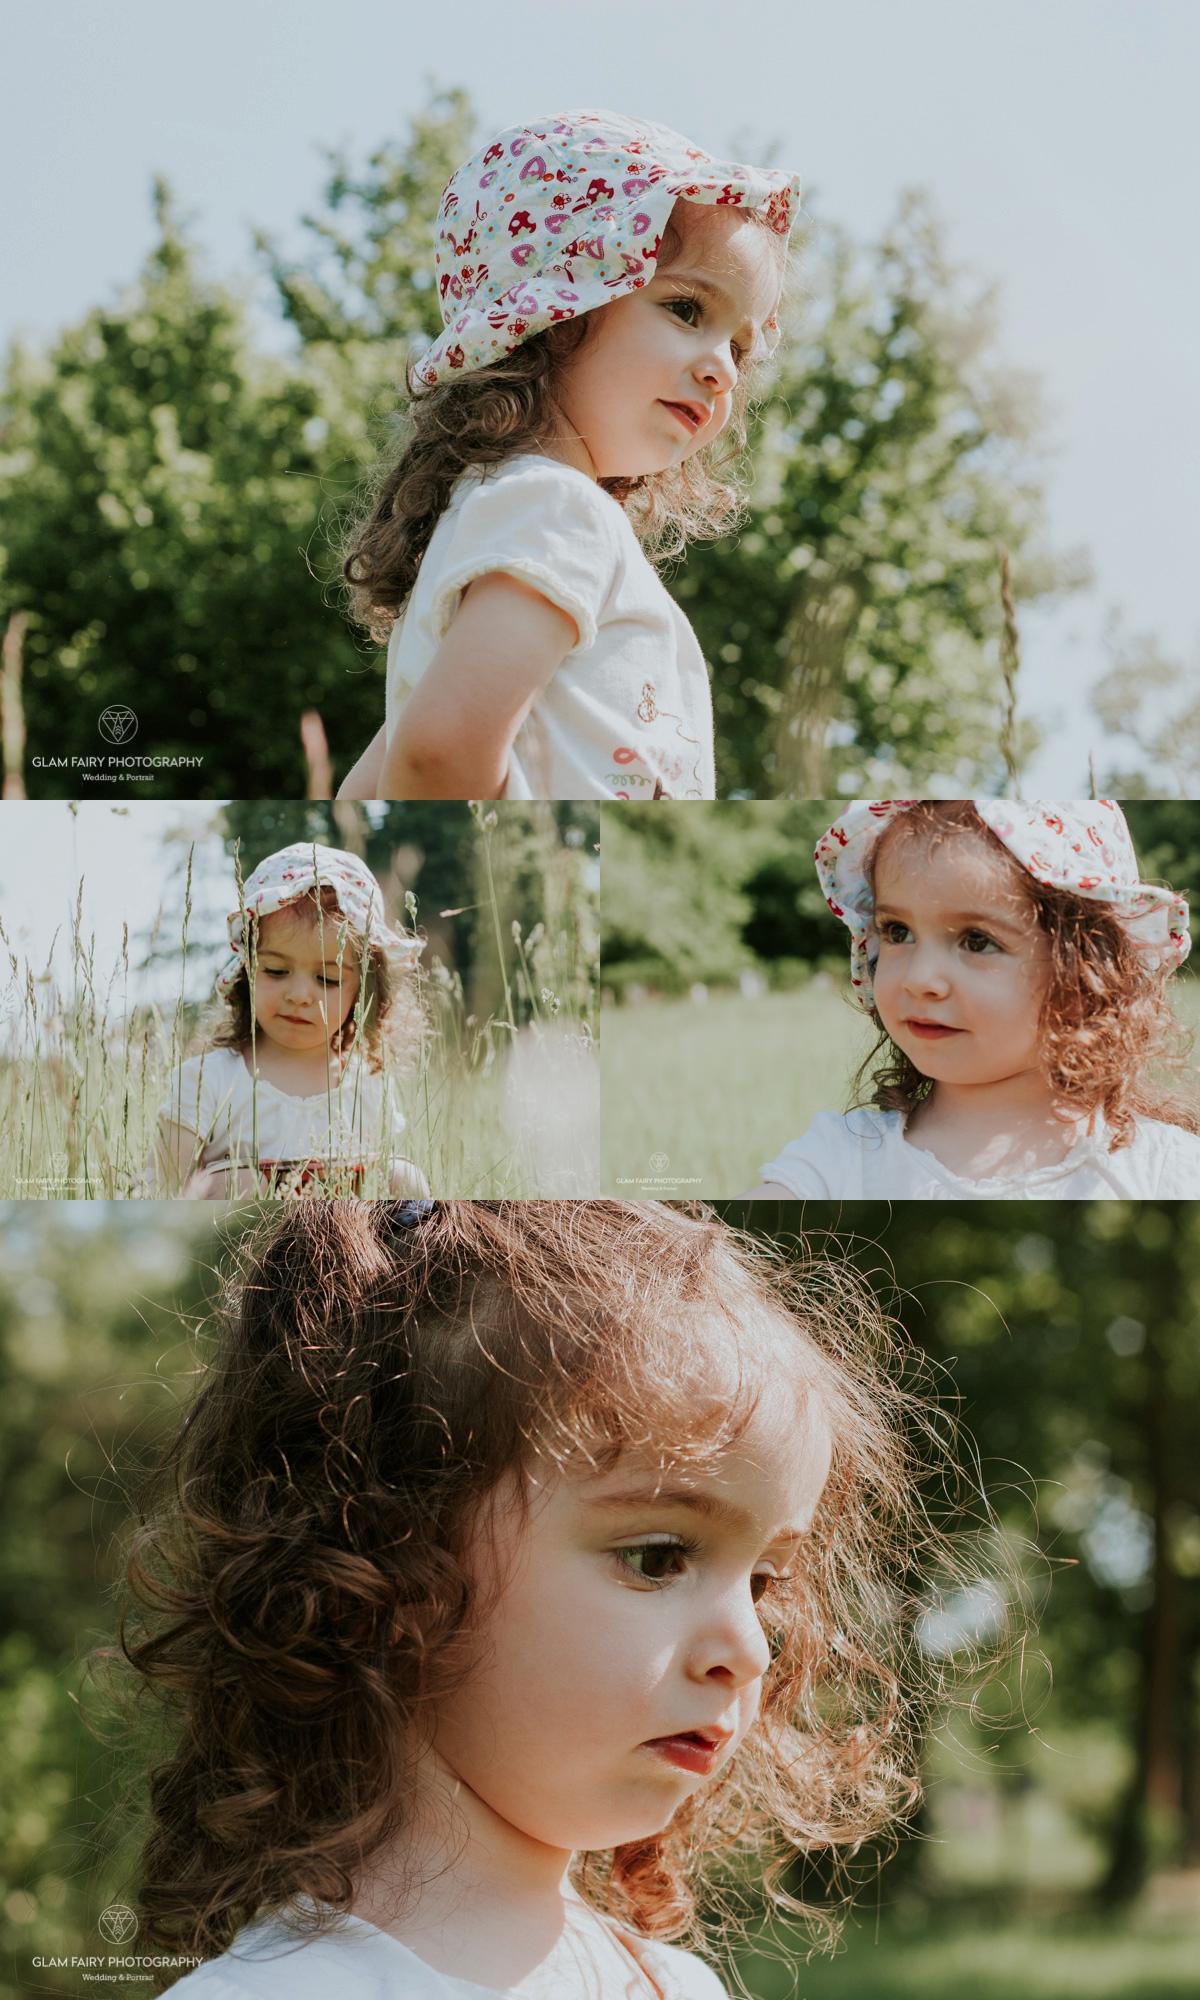 GlamFairyPhotography-photographe-seance-enfant-noisiel-thais_0001